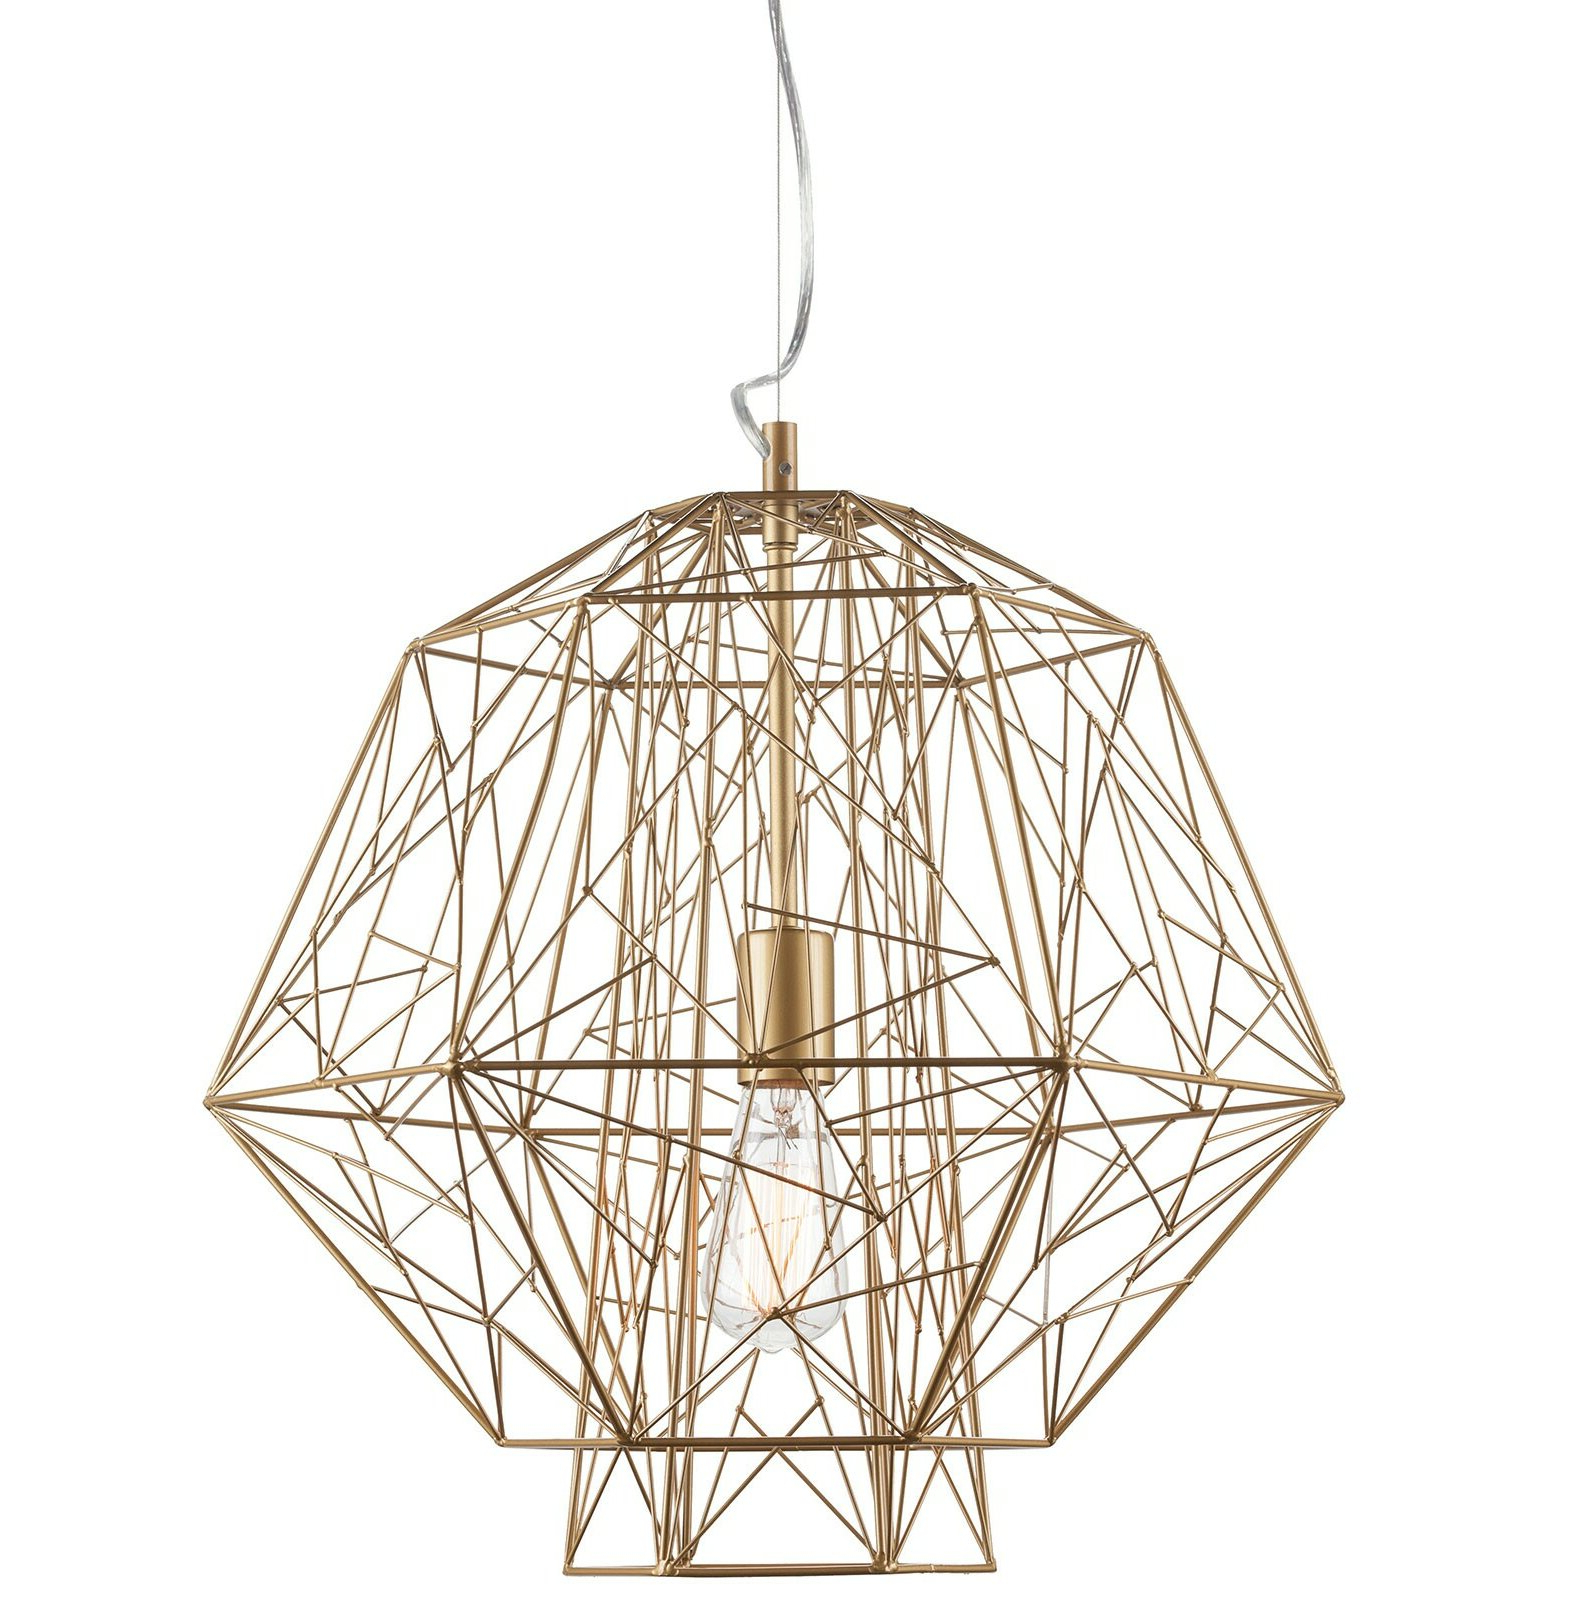 Famous Epstein 1 Light Geometric Pendant Within Hydetown 1 Light Single Geometric Pendants (Gallery 7 of 20)